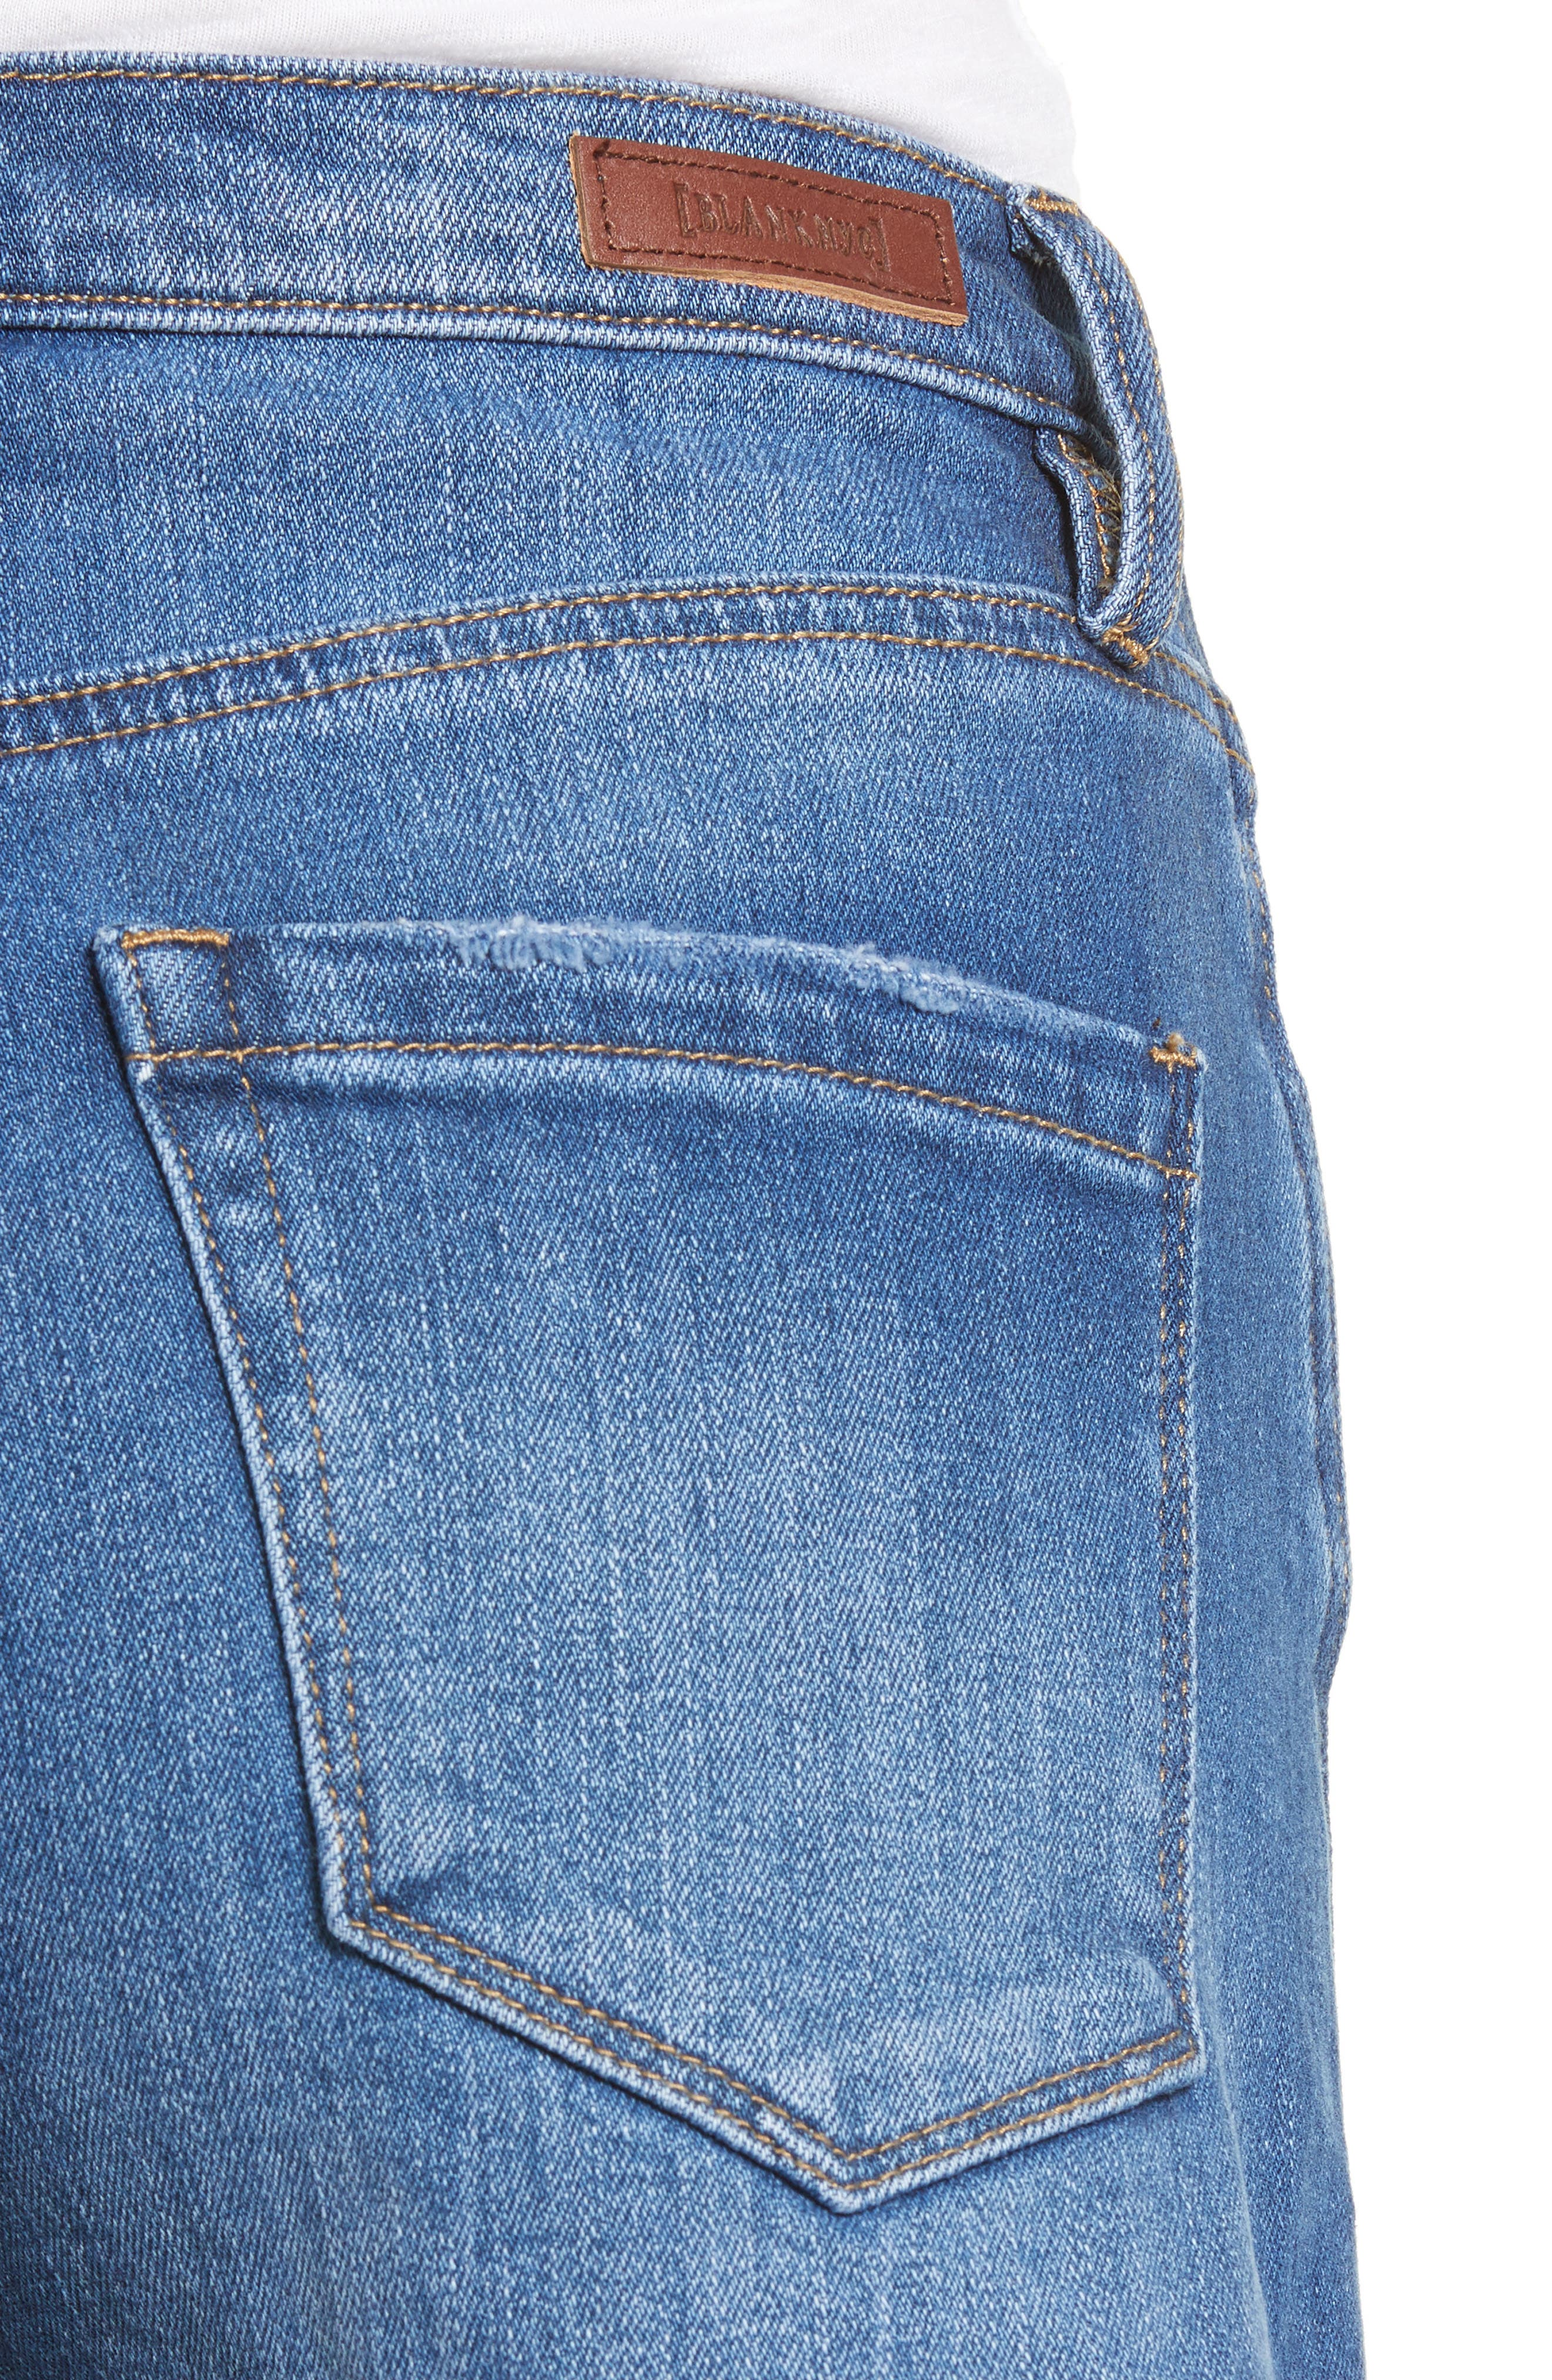 The Lenox High Waist Cutoff Denim Shorts,                             Alternate thumbnail 4, color,                             Low Key